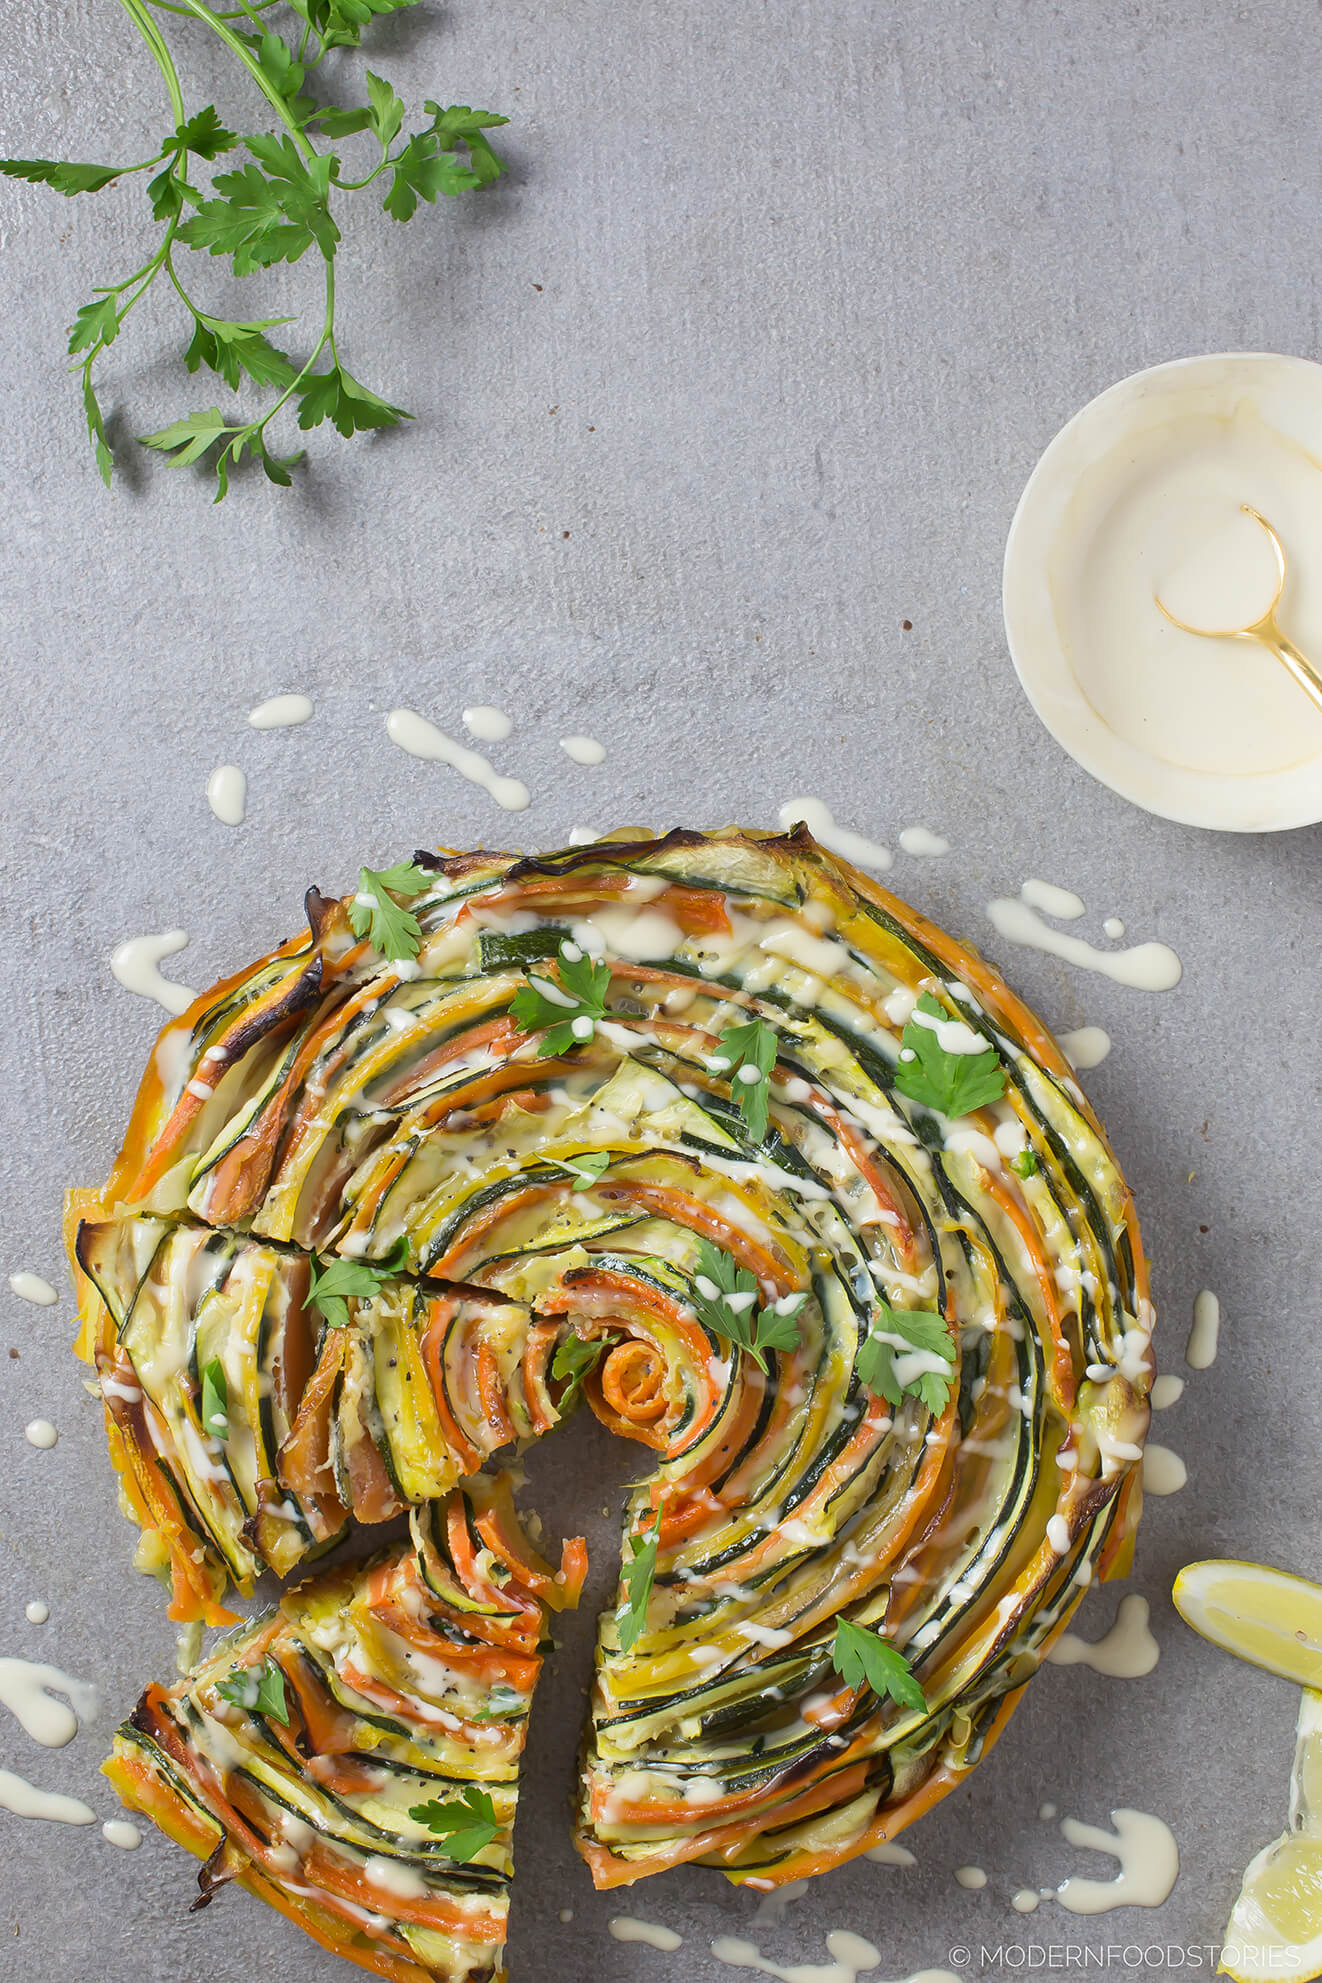 grain free recipes, Grain free pie, Paleo quiche, Paleo pie, Keto pie, Keto breakfast recipes, frittata, Modern Food stories, Paleo Crust, courgette and carrot swirl, gluten free quiche,